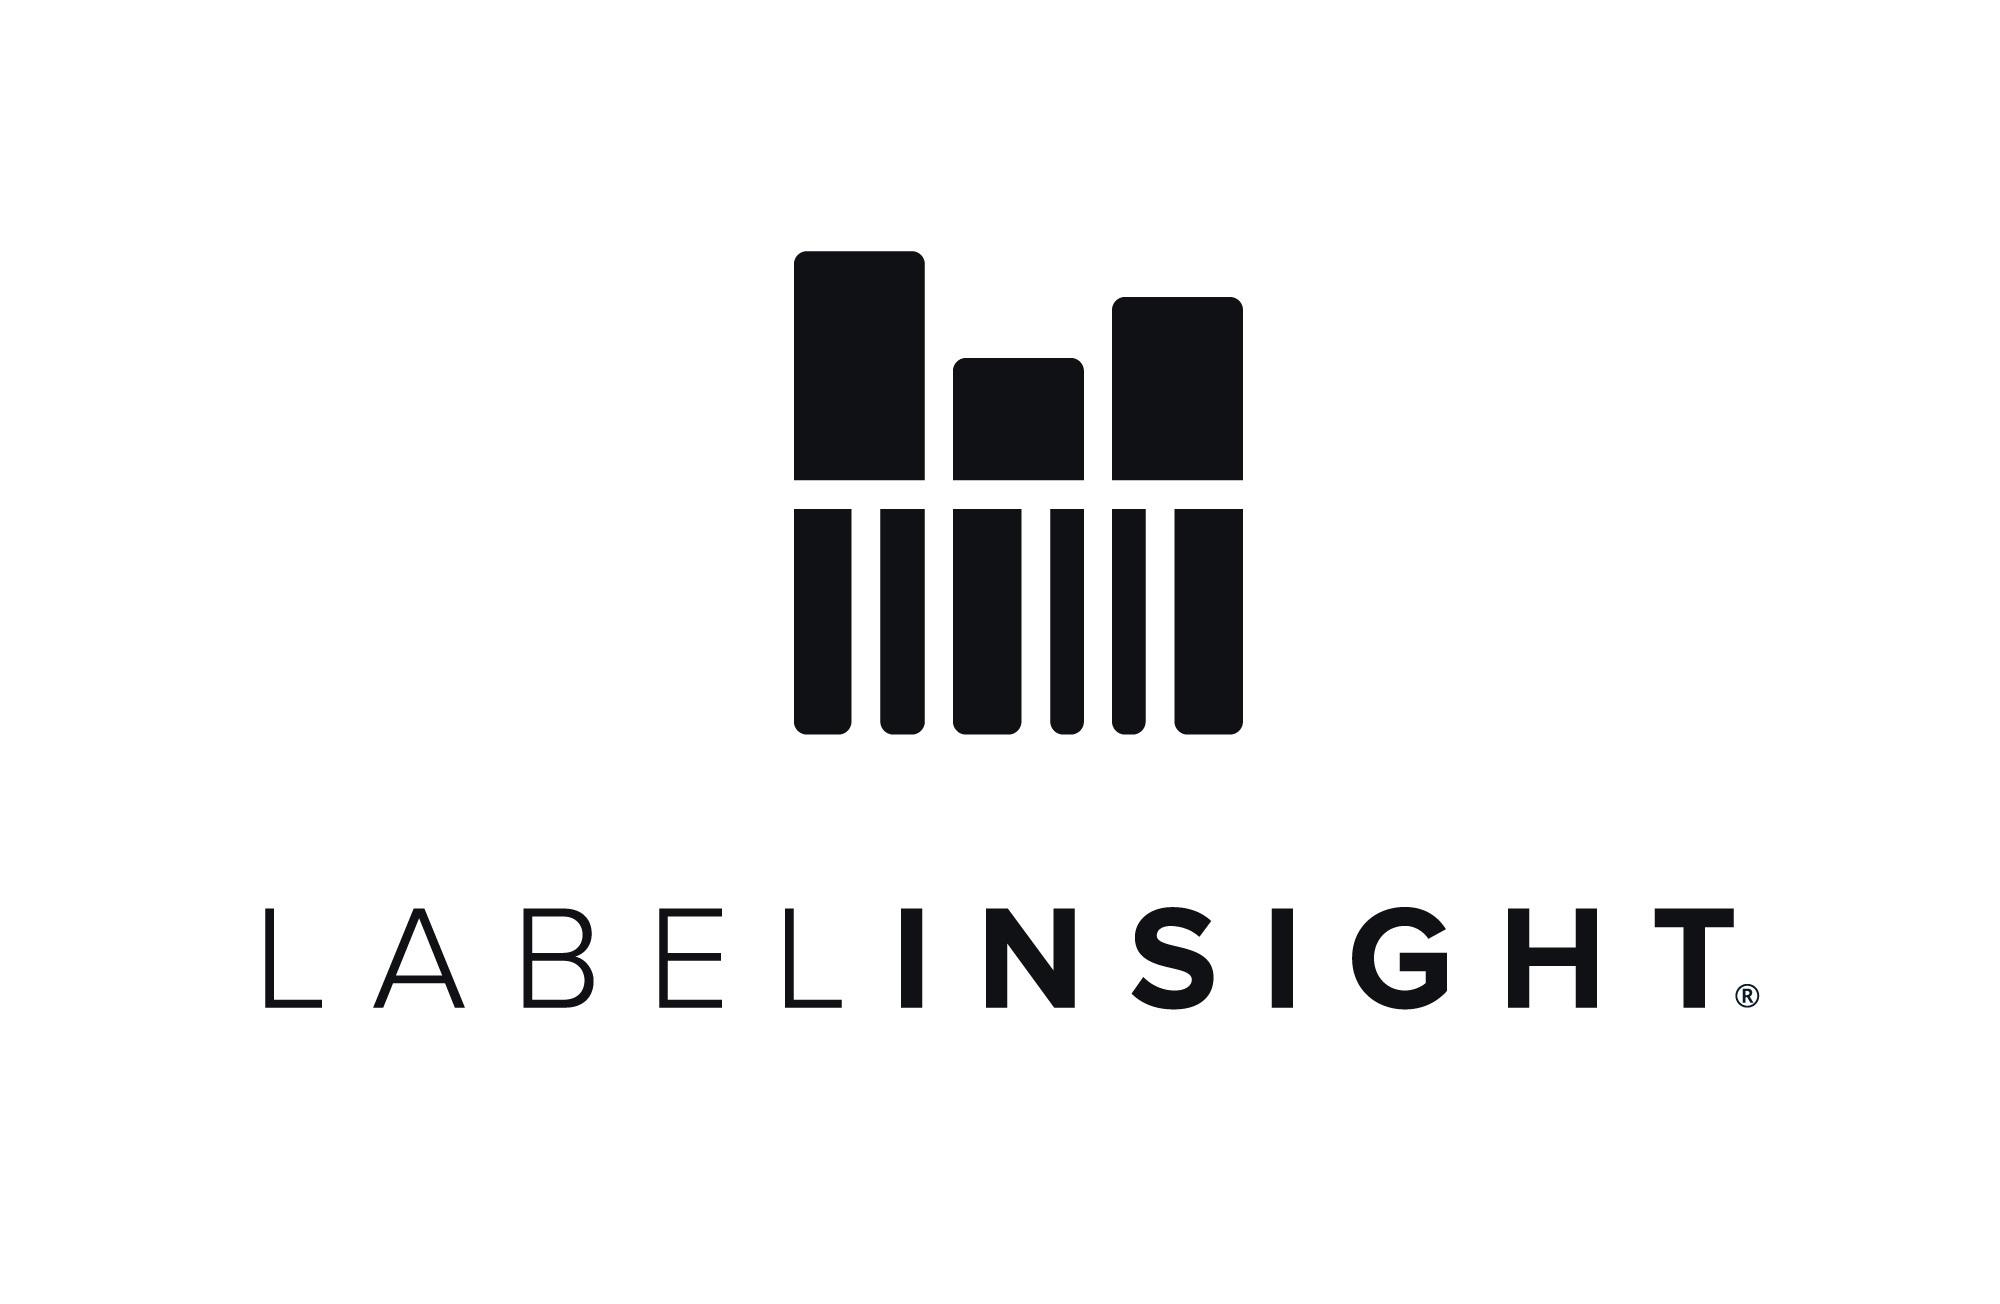 Label Insight logo - Transparency Matters (PRNewsfoto/Label Insight)